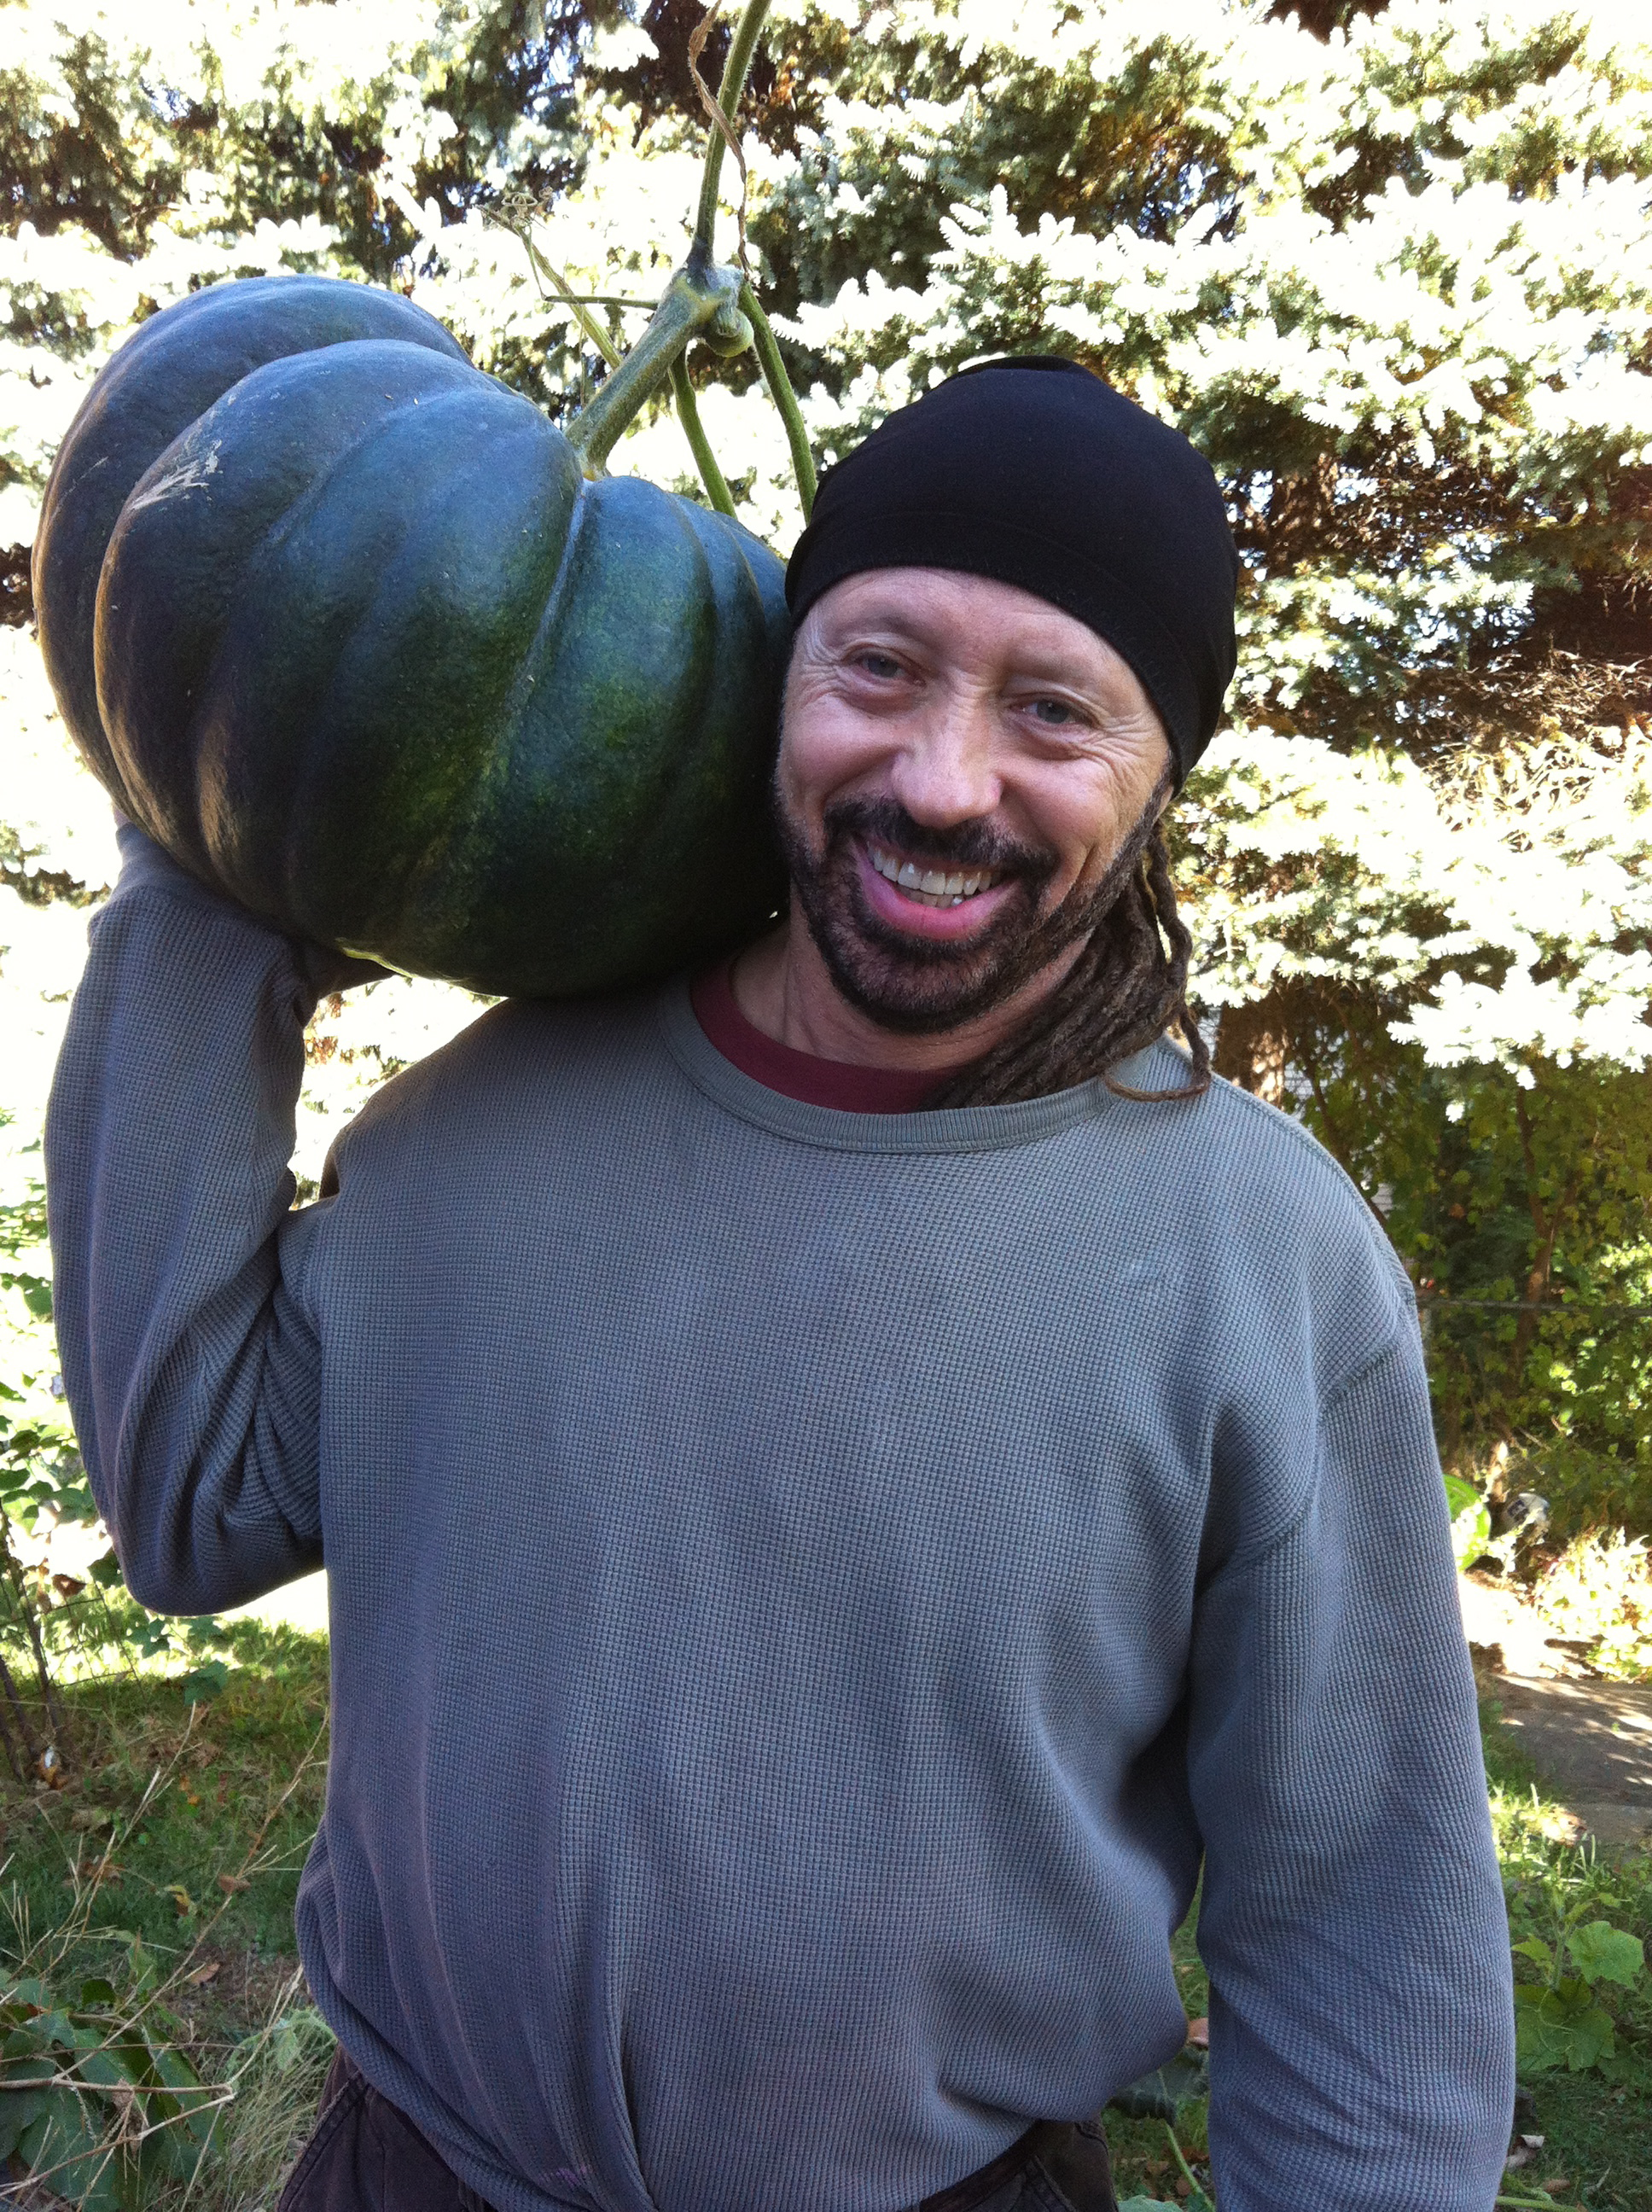 1st Pumkin harvest